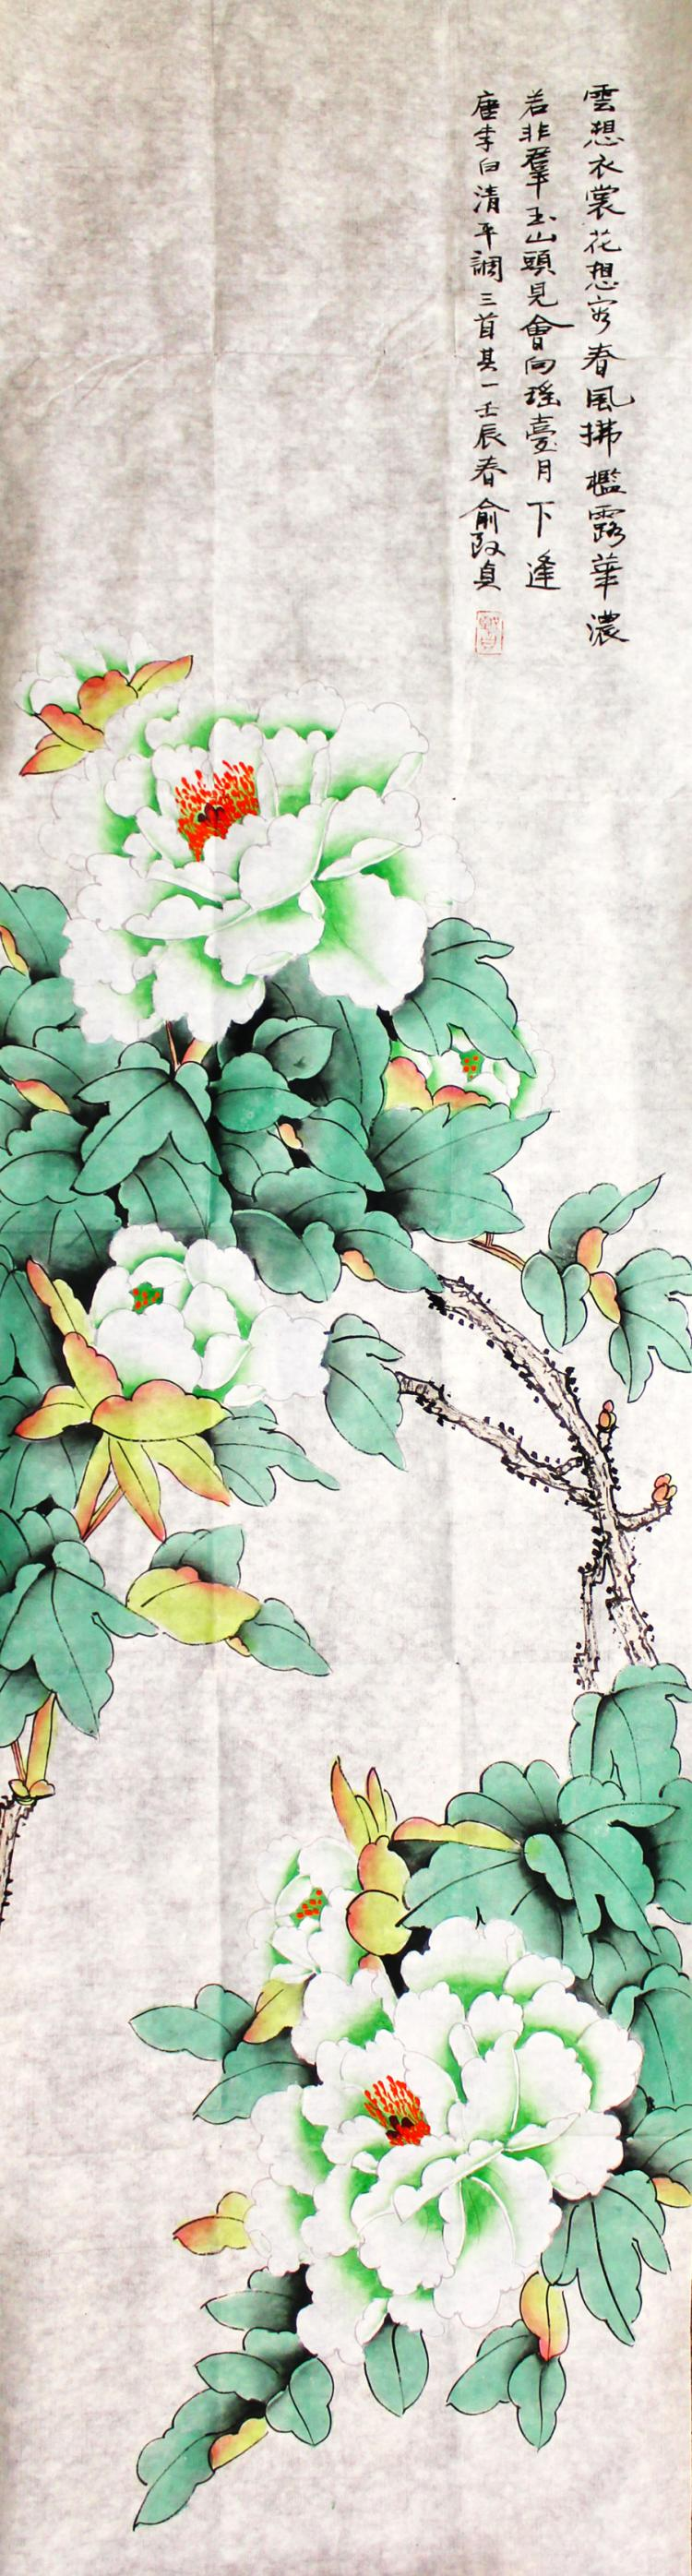 YU ZHIZHEN (1915 - 1995) CHINESE FLOWER PAINTING